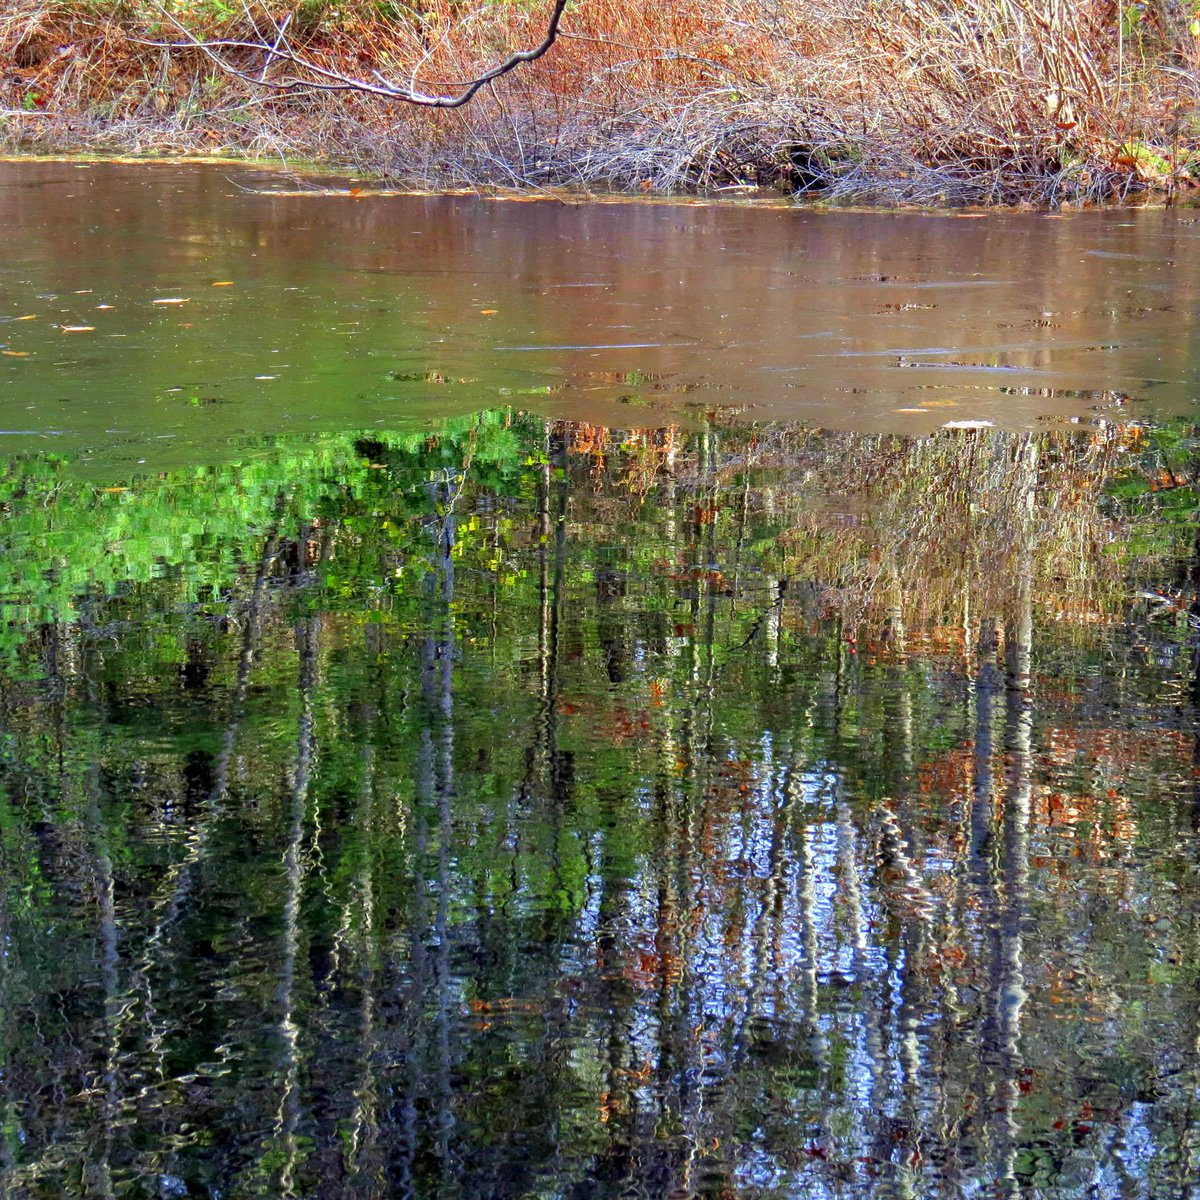 12. Ice on High Blue Pond